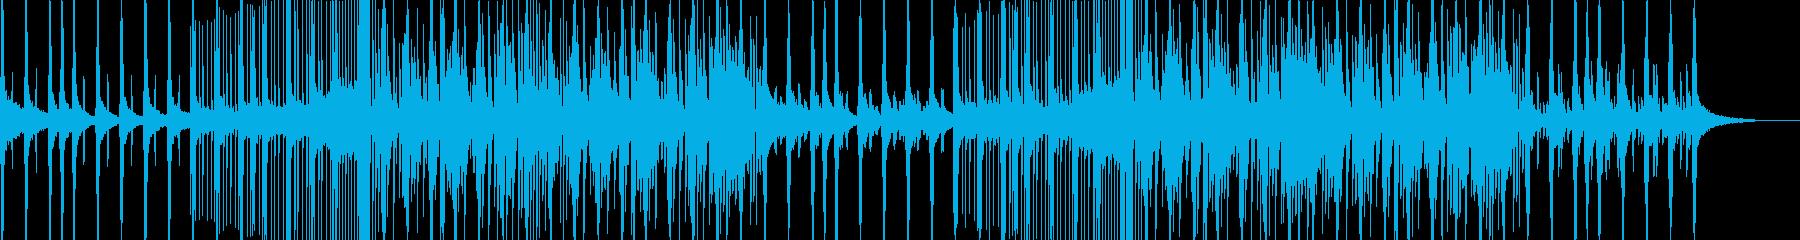 Future Bass エンディングの再生済みの波形